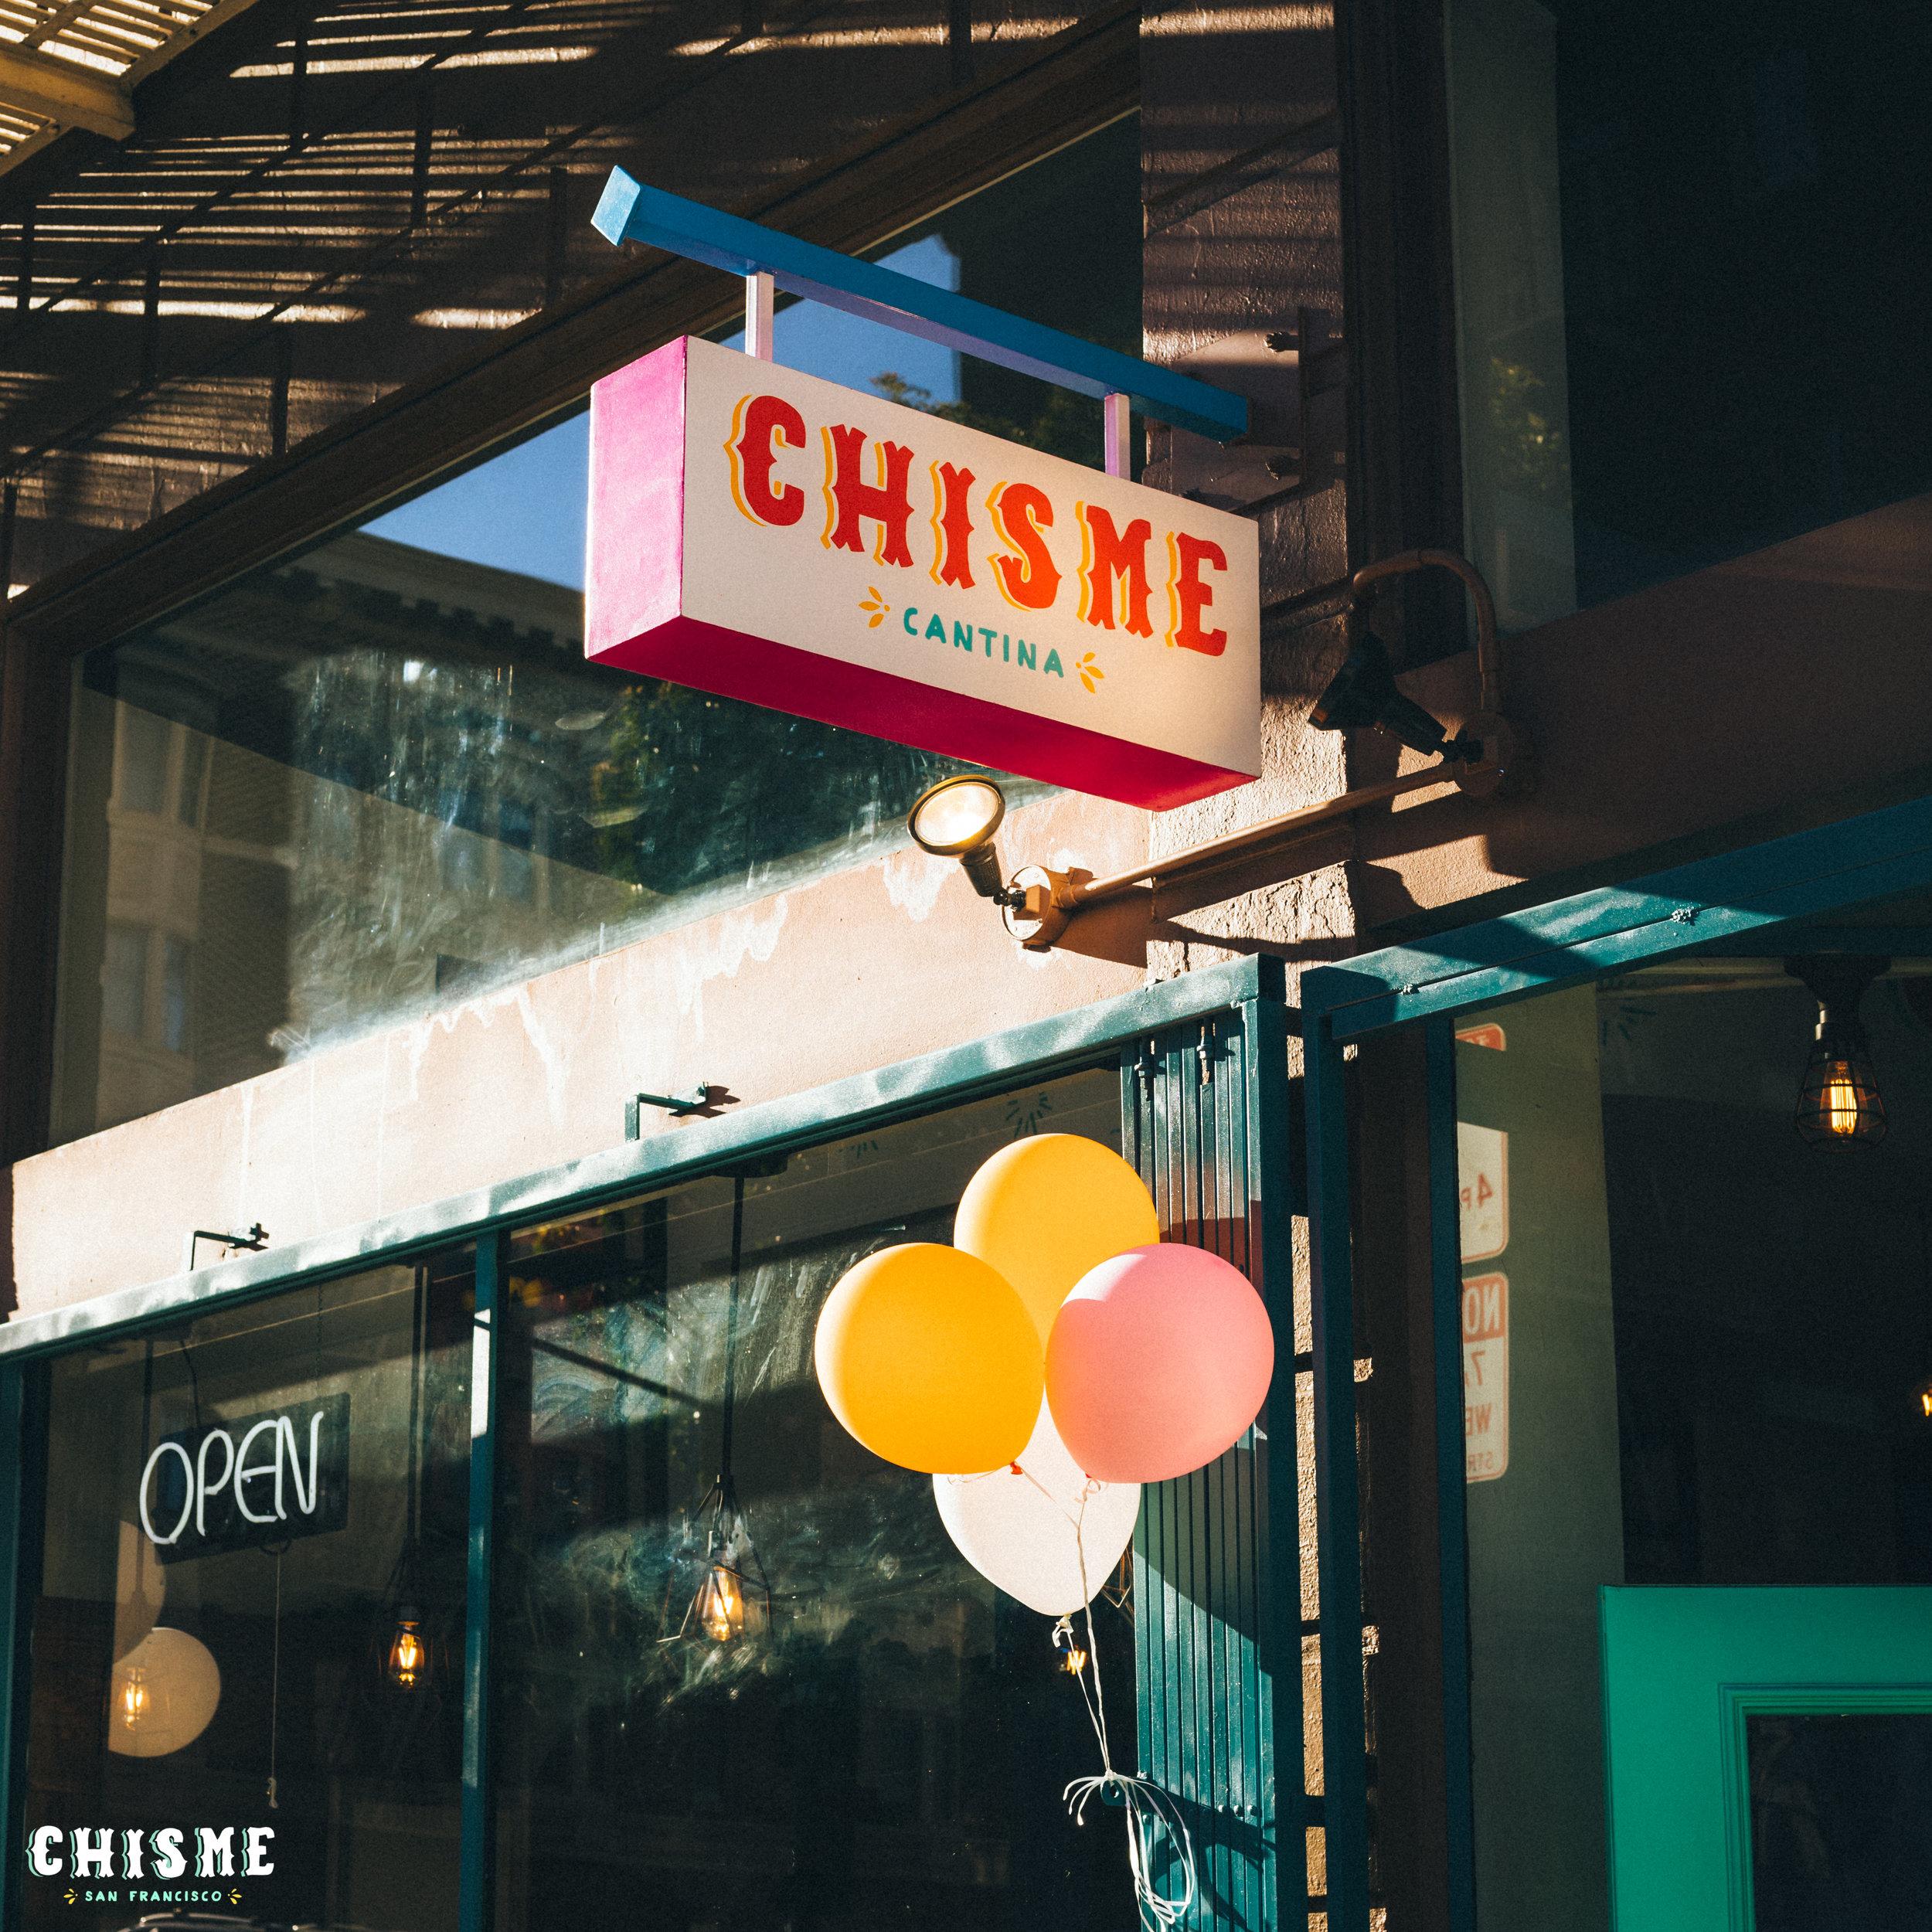 kake-chicago-best-content-creation-chisme-sf-8.jpg